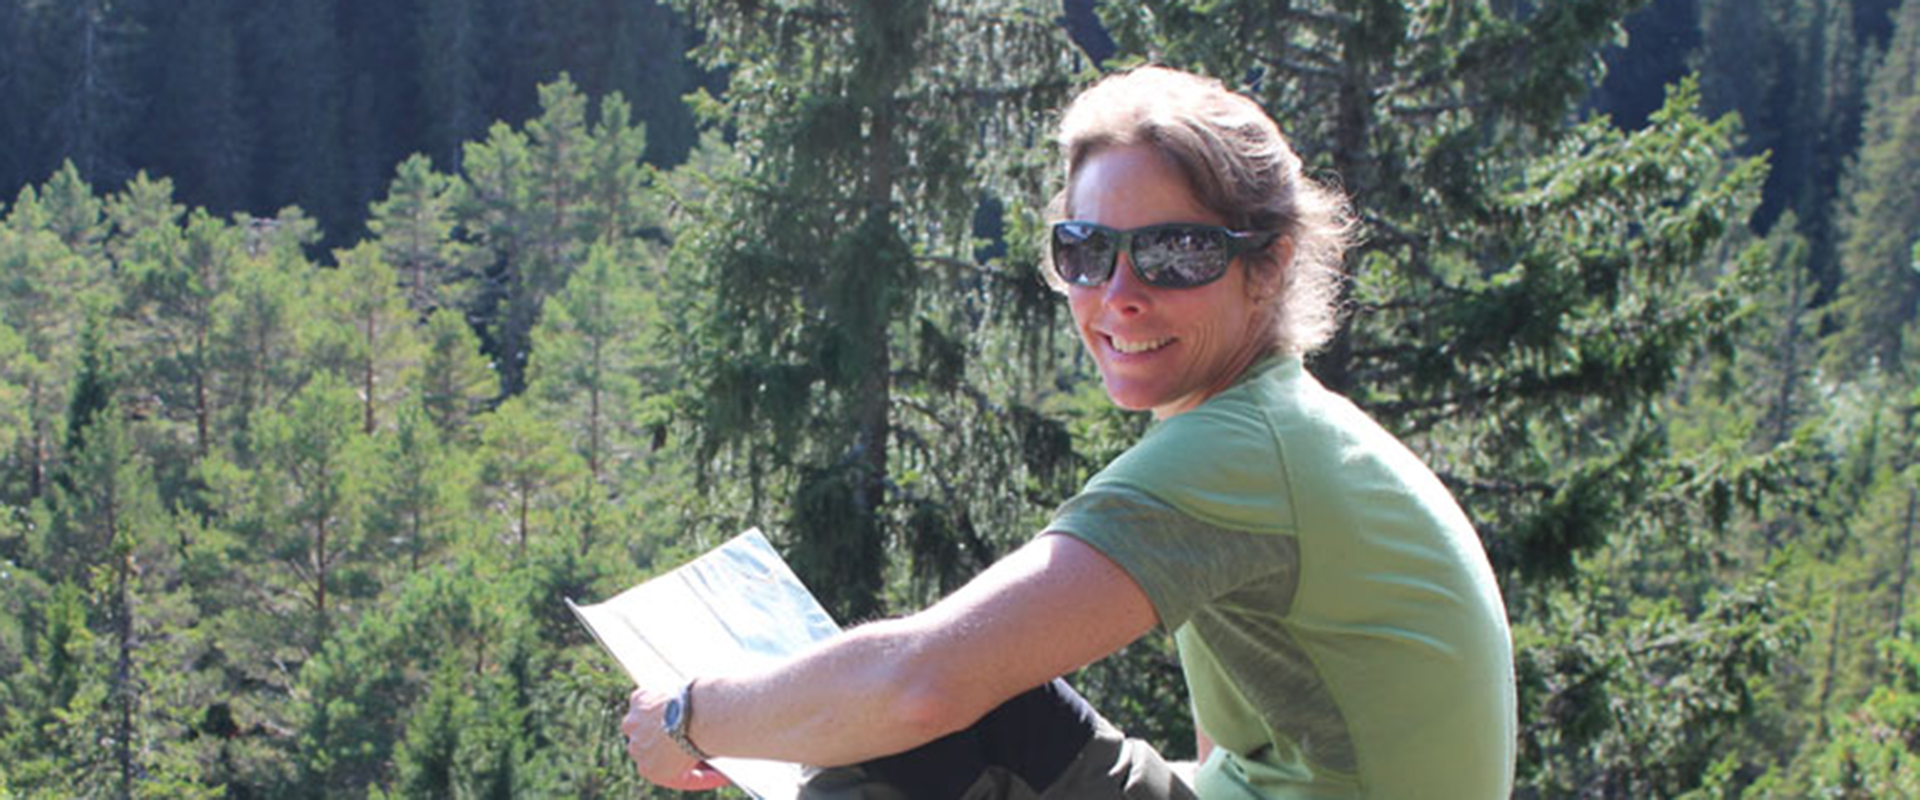 Sofie Jugård Löfgren, Aktivut Travel